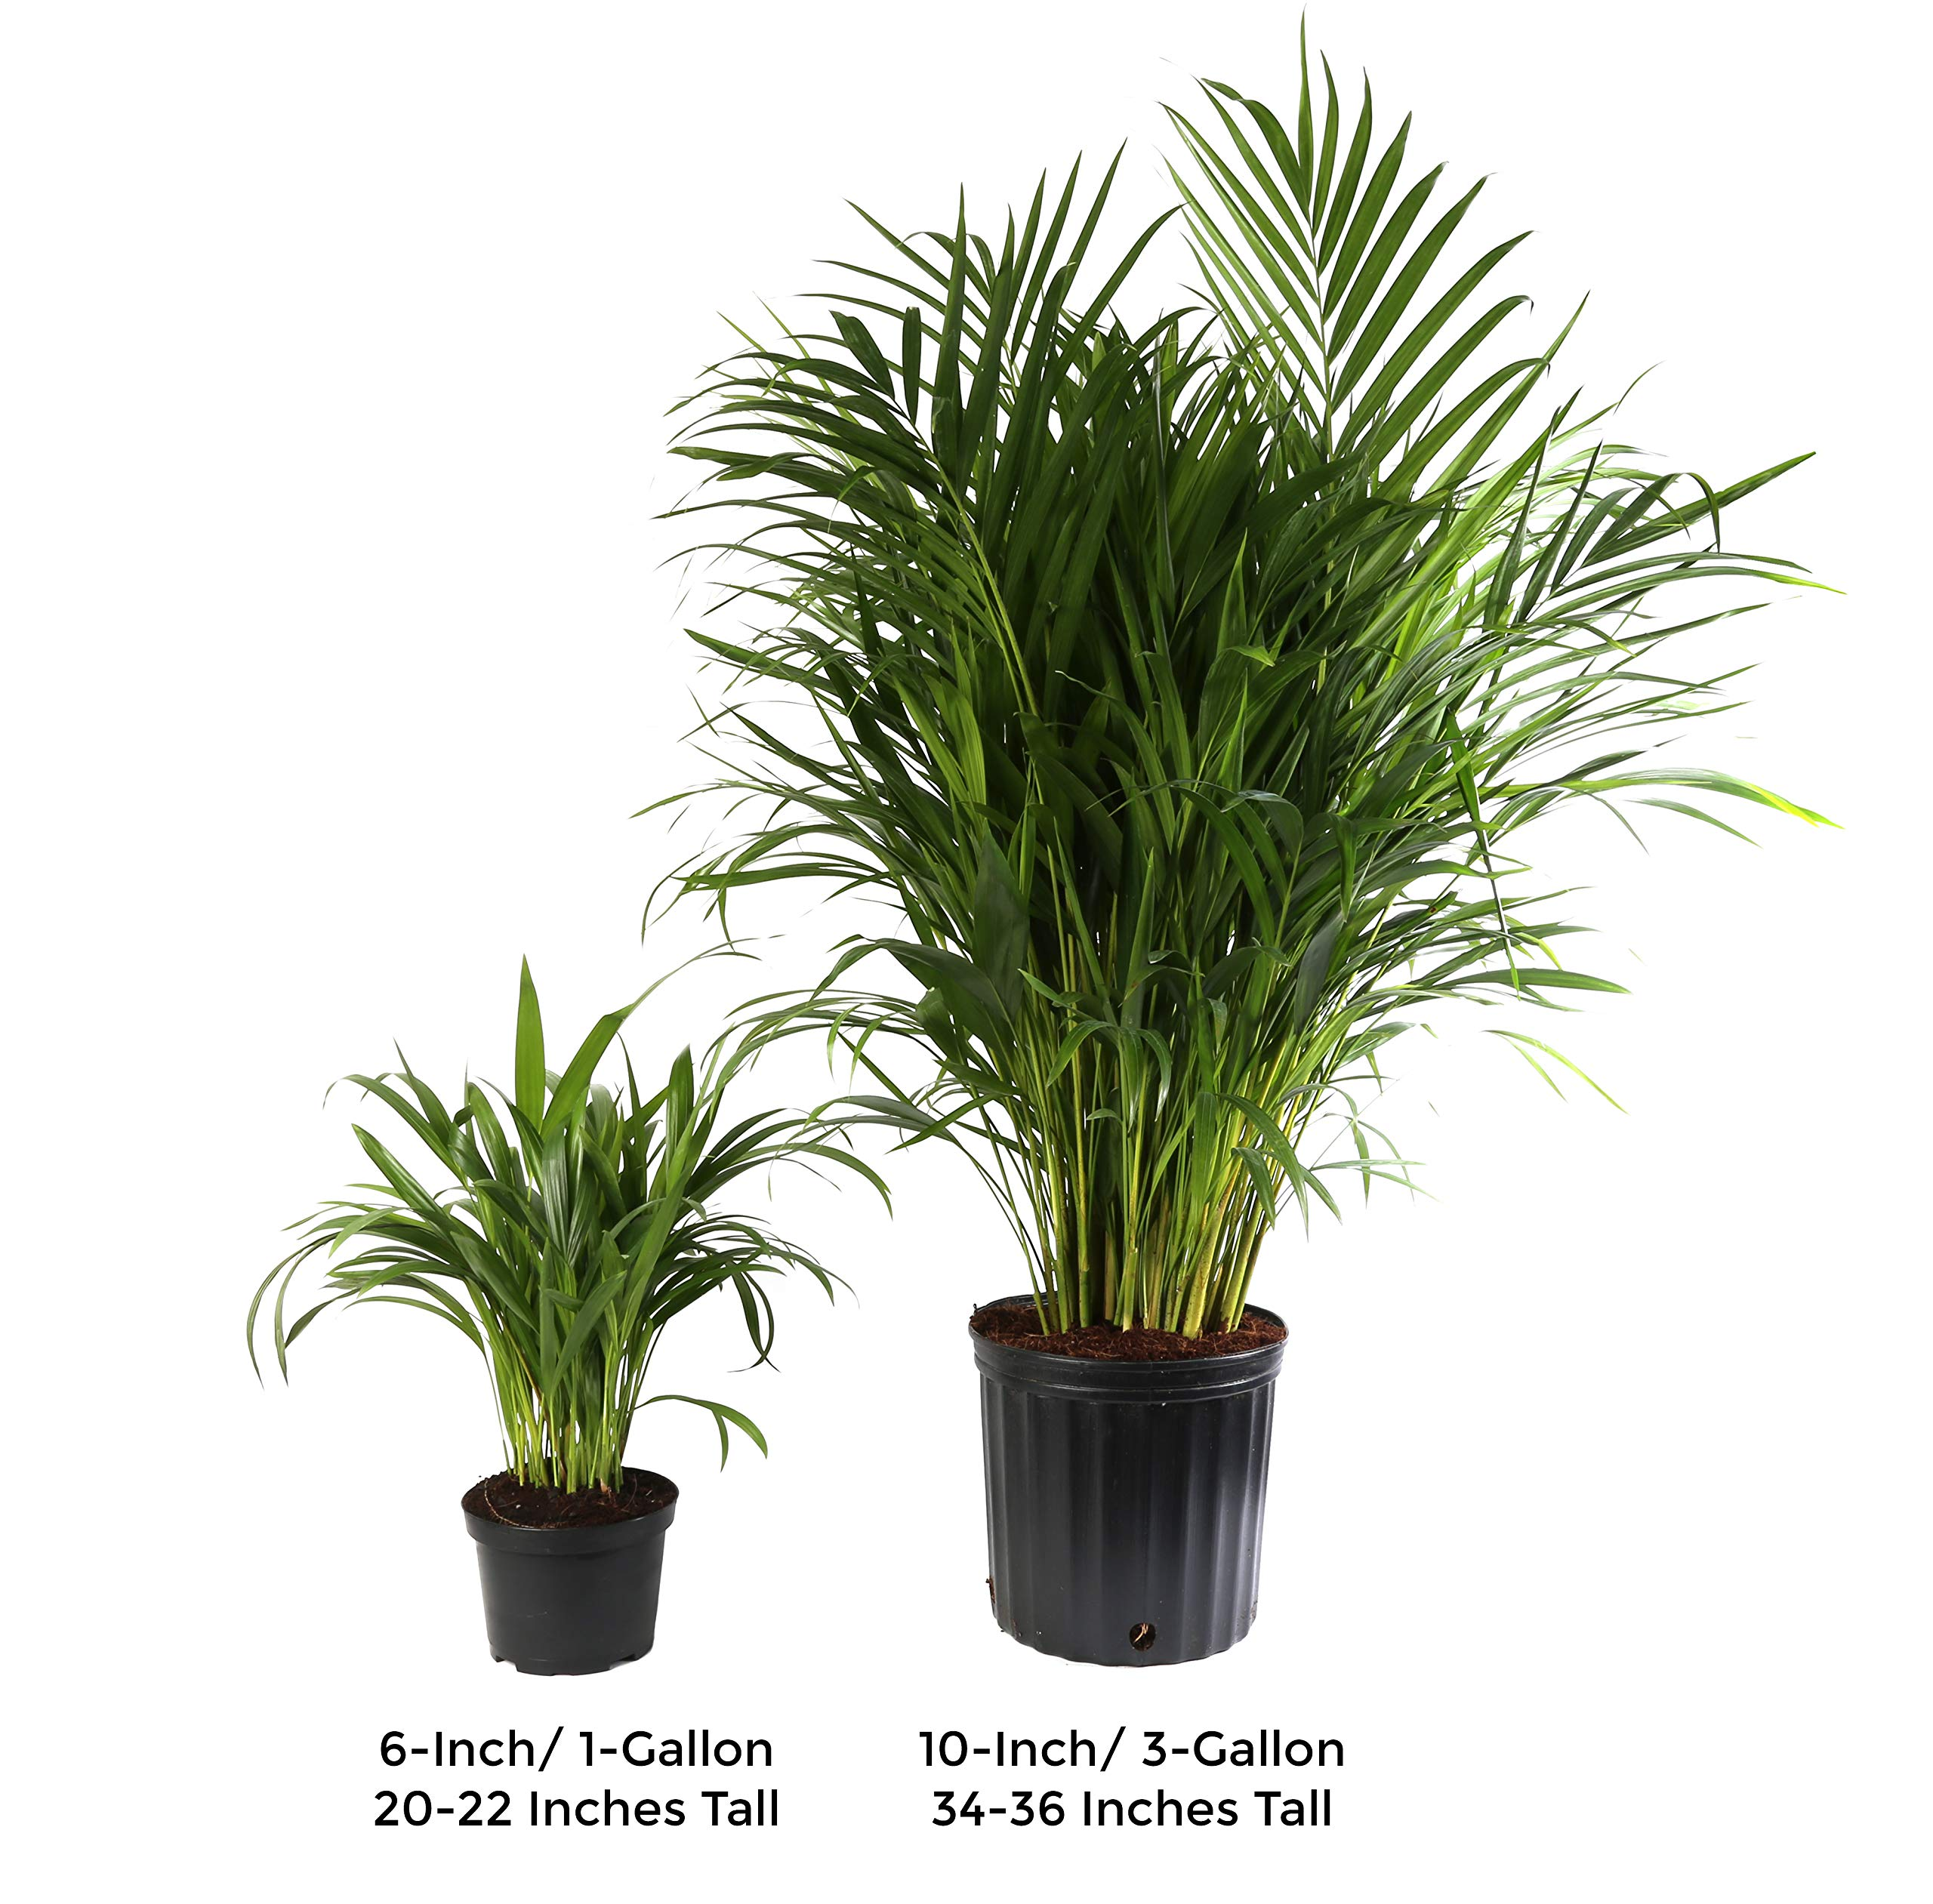 Costa Farms Live Areca Palm in Decor Planter, 3-Foot, White-Natural by Costa Farms (Image #4)